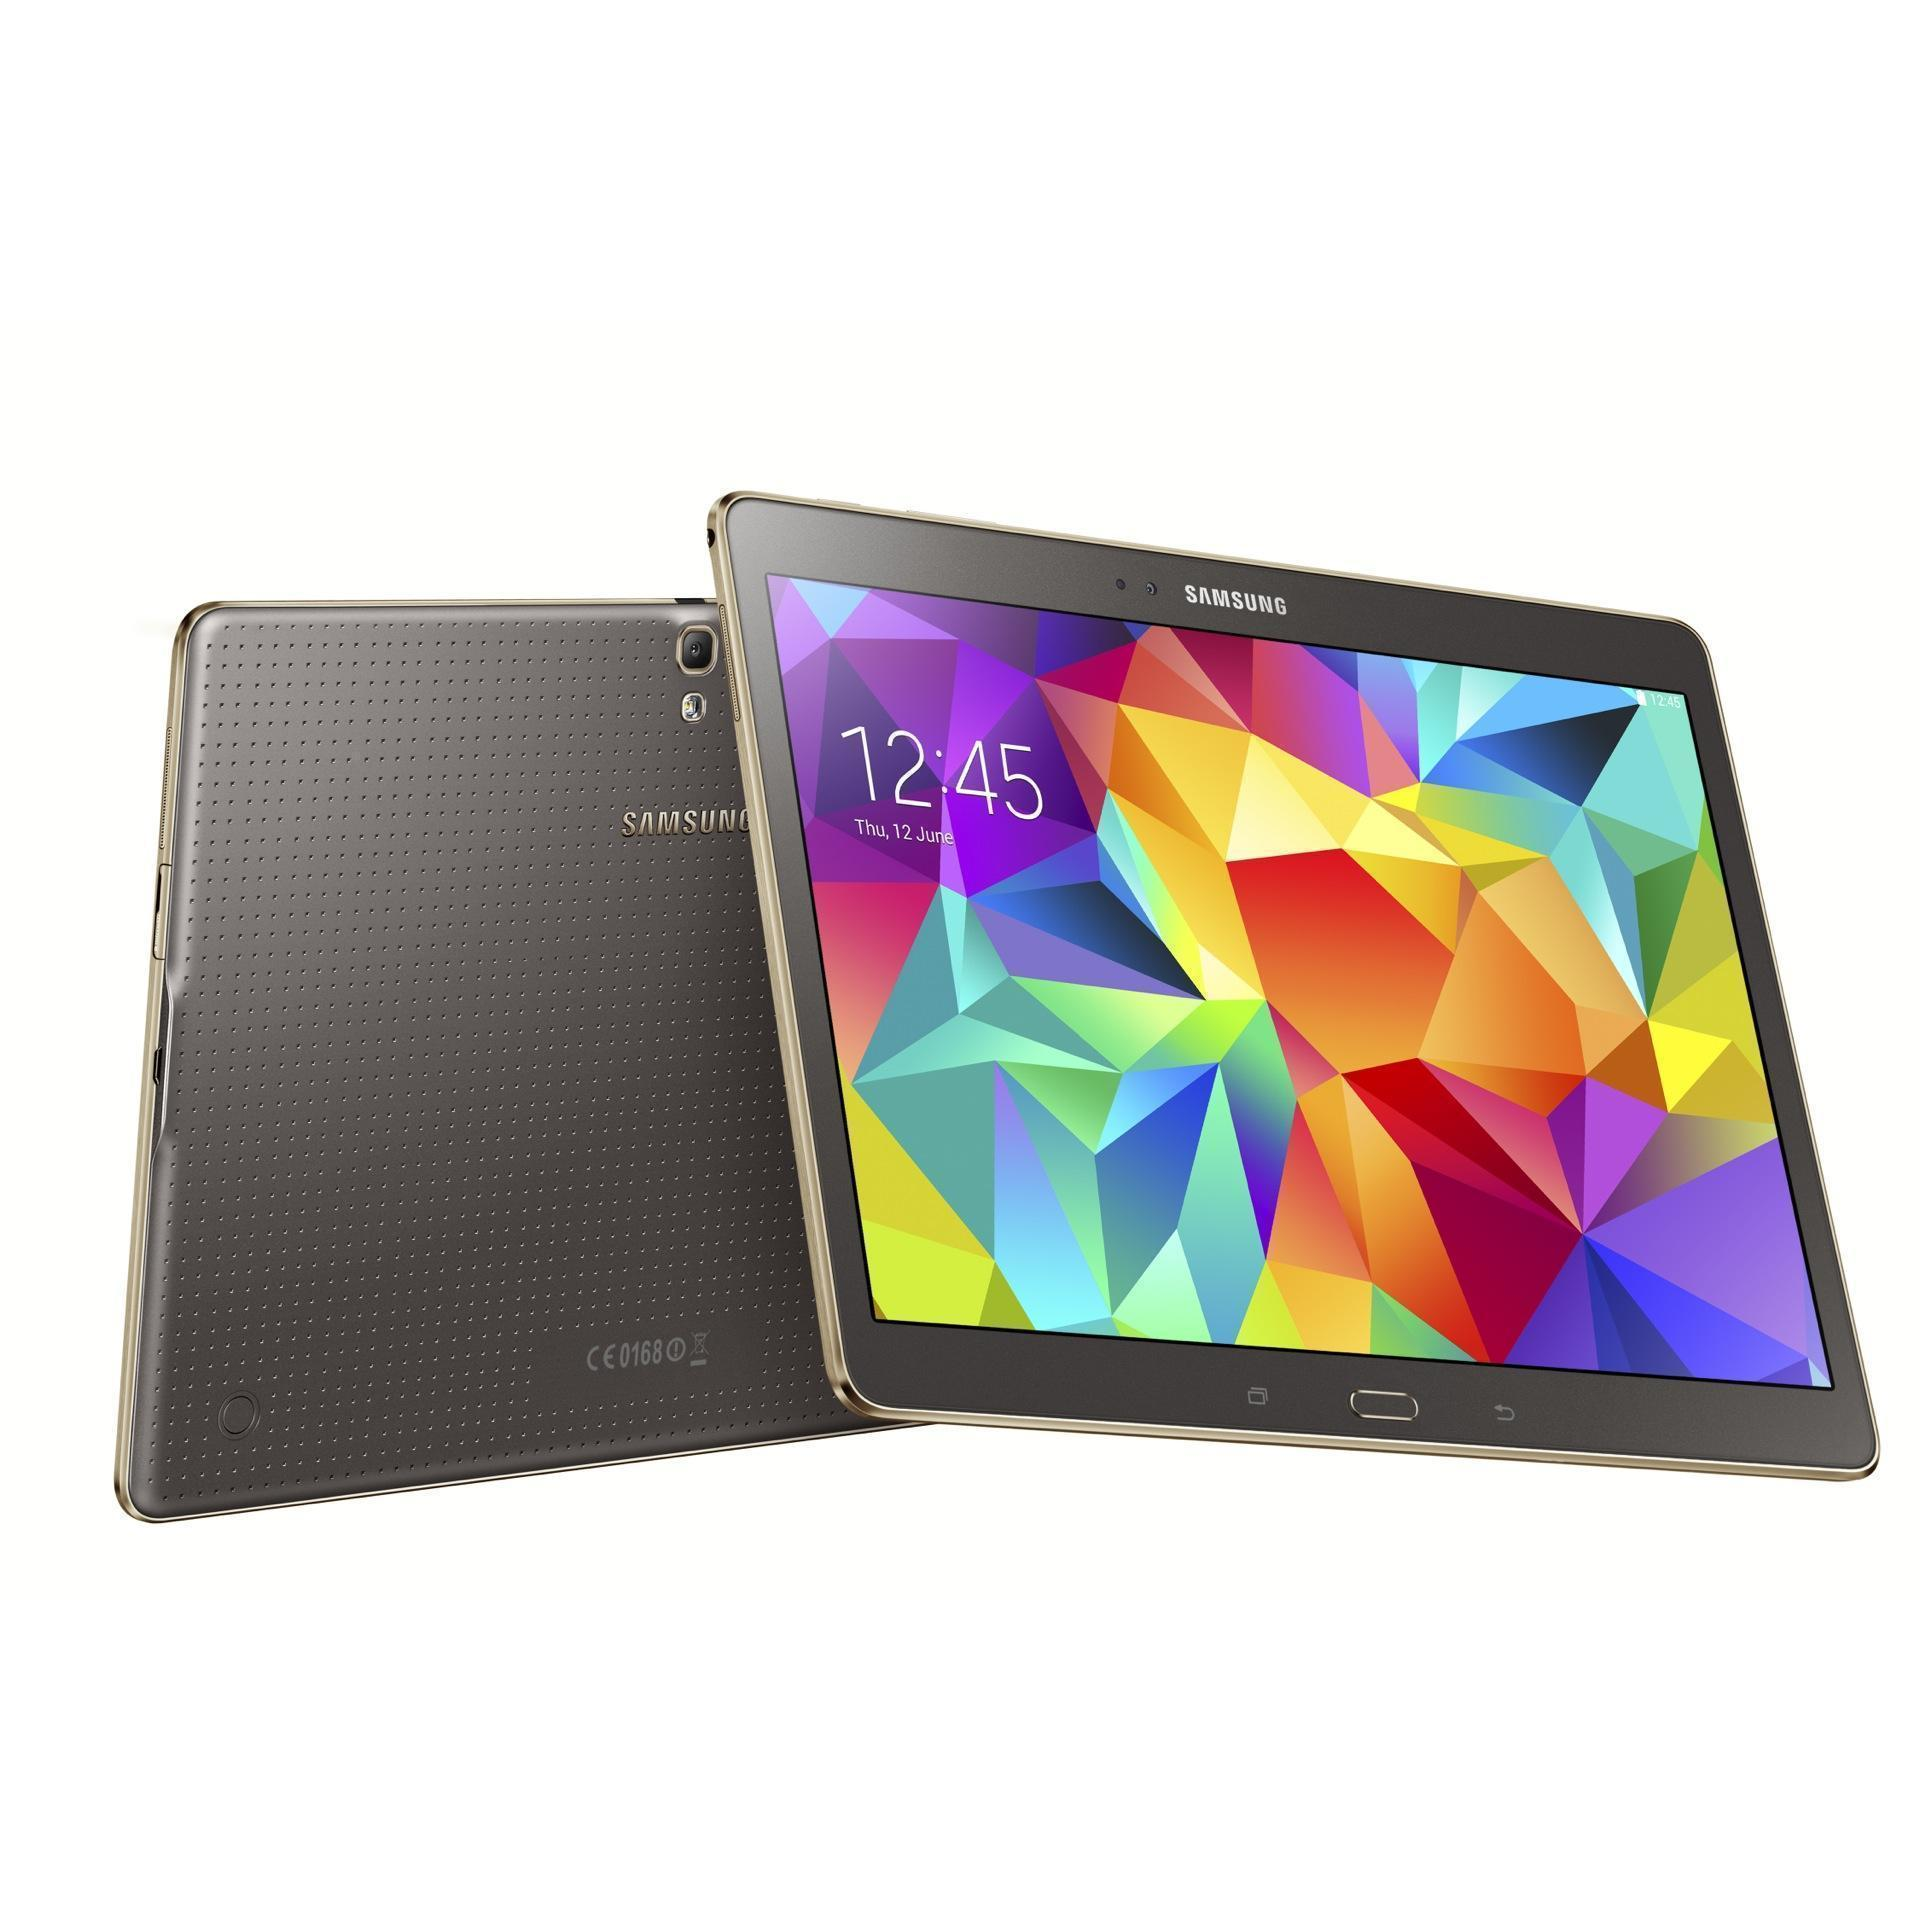 "Samsung Galaxy Tab S SM-T705 - 8,4""  - 16 GB - WLAN + LTE - Bronze"